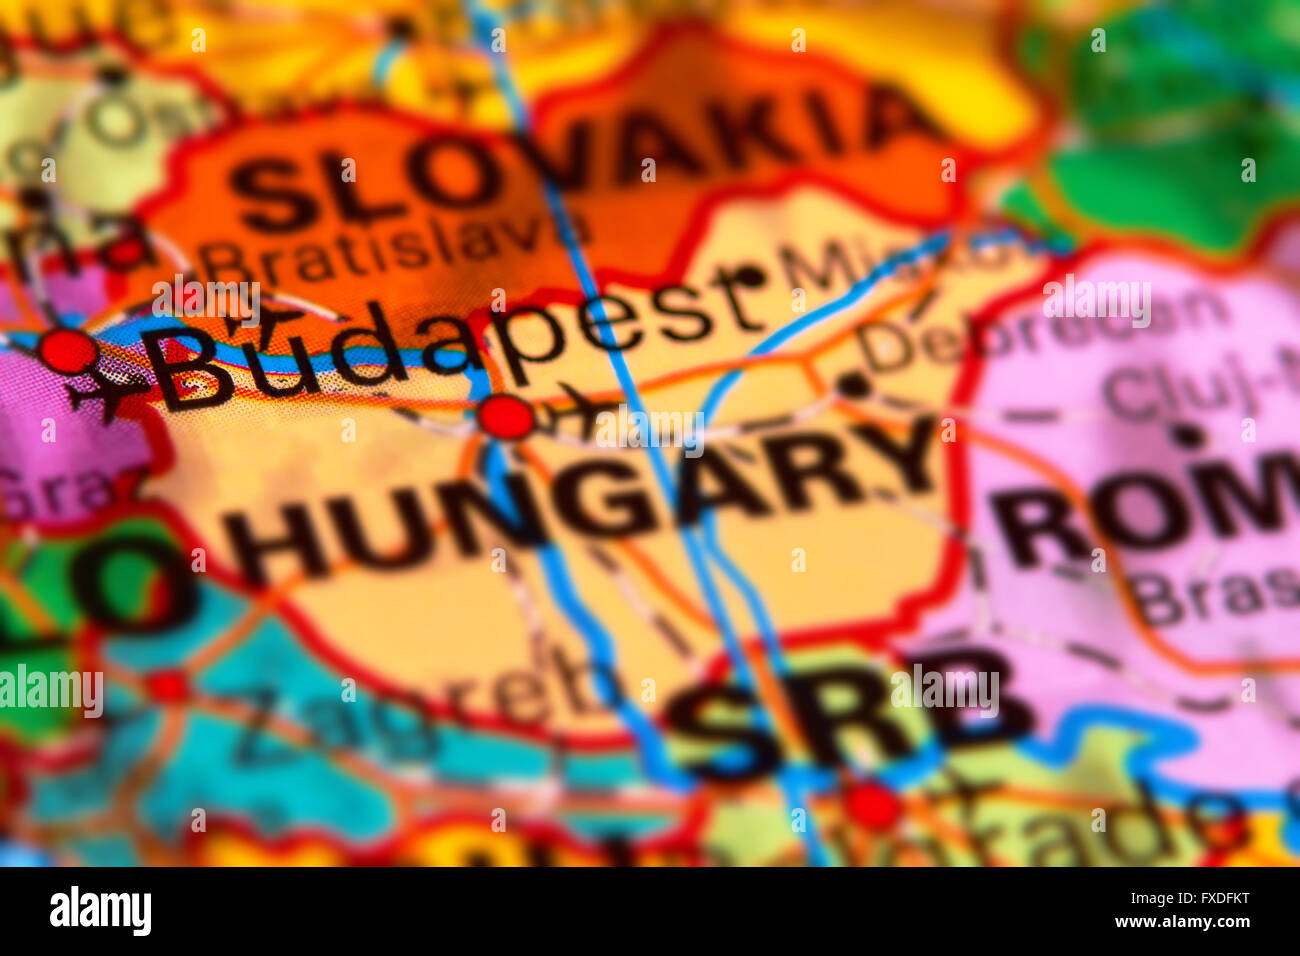 Budapest capital city of hungary on the world map stock photo budapest capital city of hungary on the world map gumiabroncs Choice Image